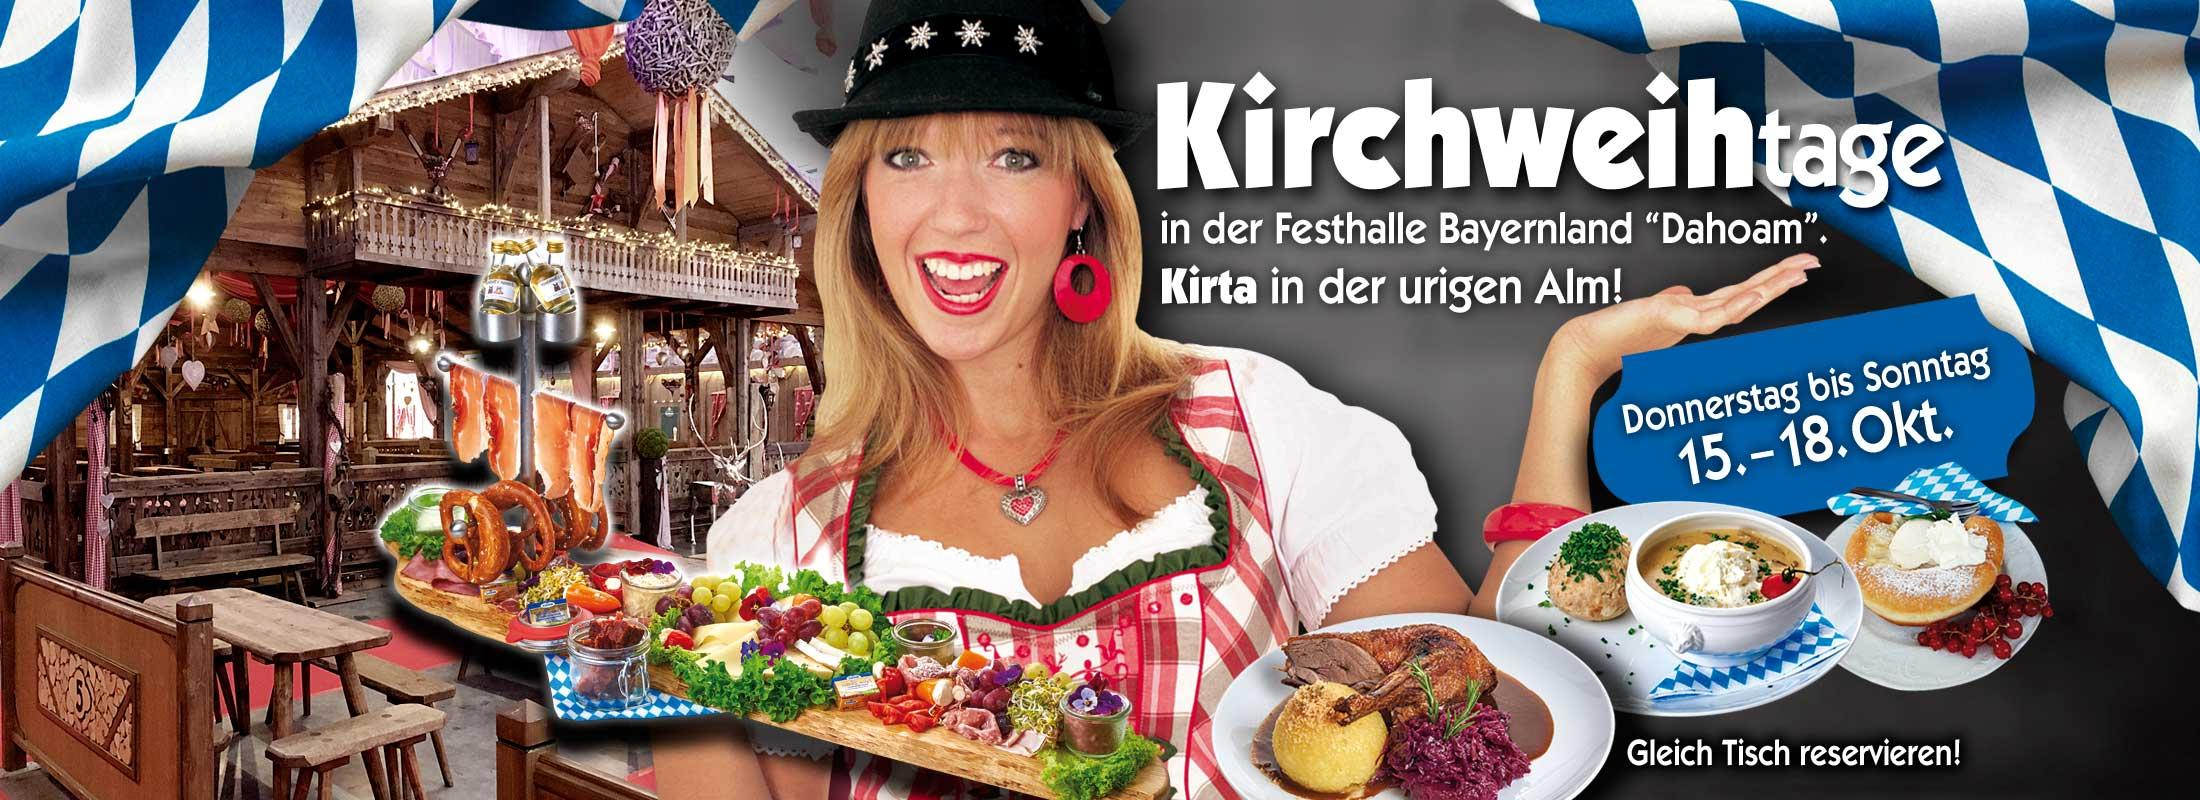 Slider-Bild-Kirchweih1-m